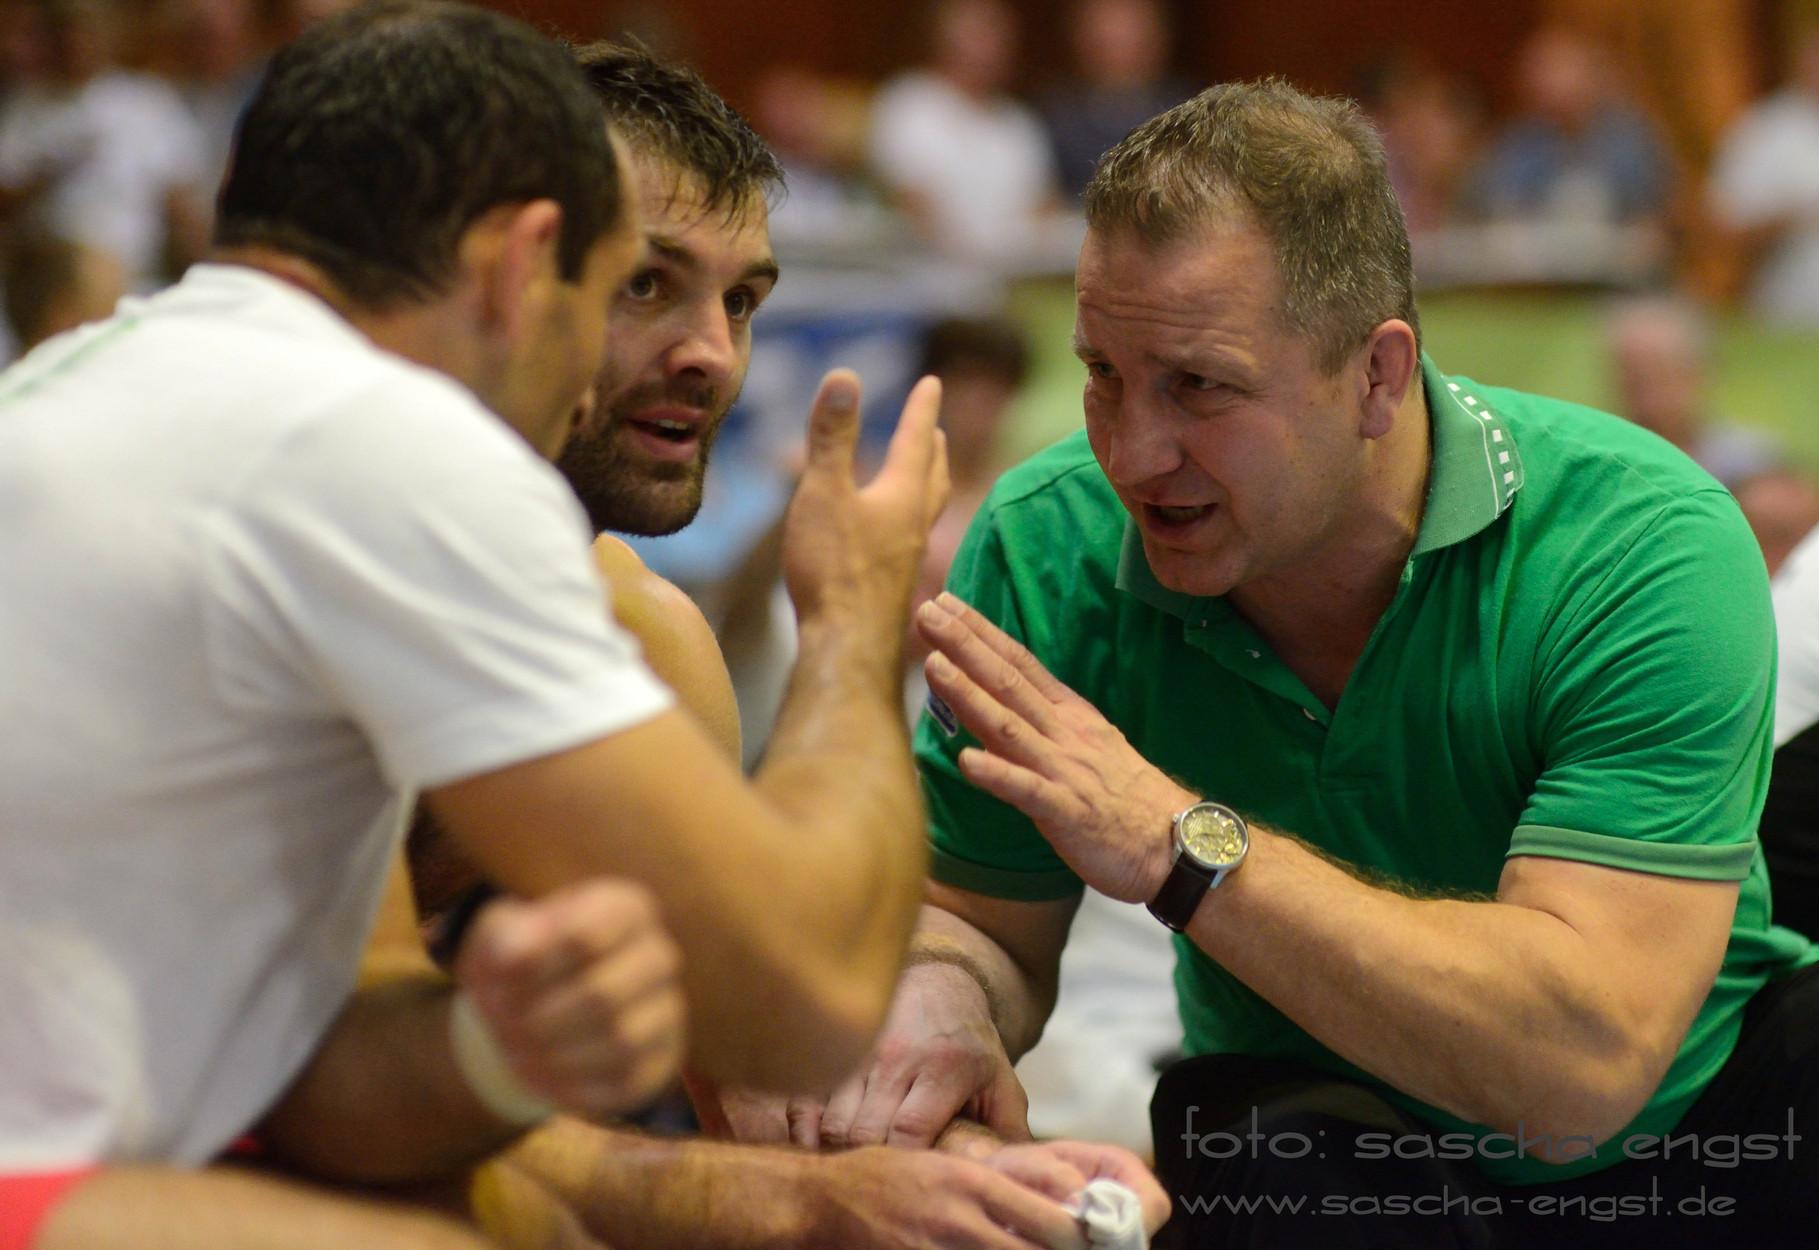 Roman Mysliewitz Trainer Bundesliga mit Sylwester Charchewski Team TKSV Duisdorf